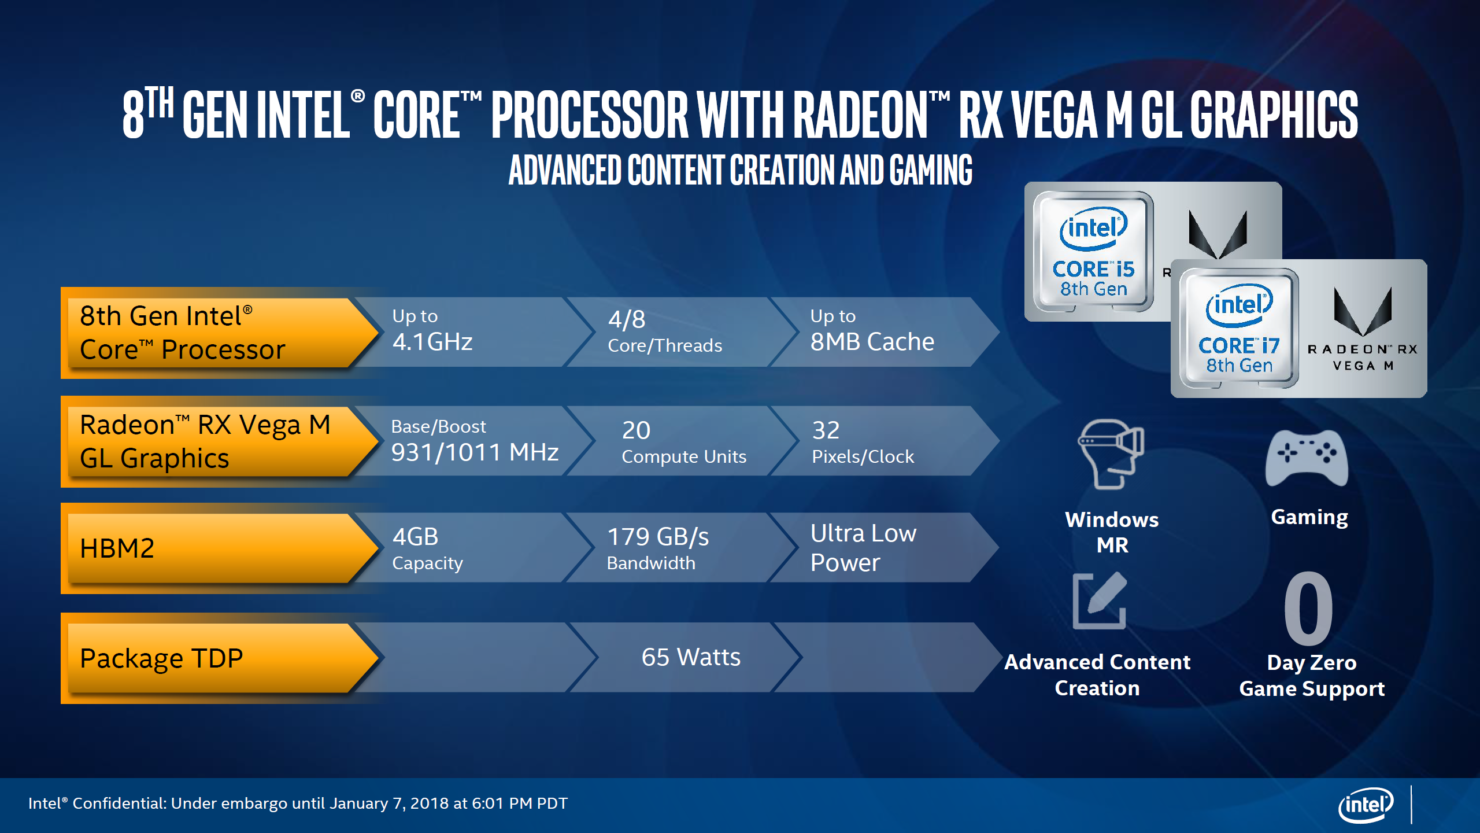 intel-8th-generation-core-processors-with-amd-radeon-rx-vega-m-graphics_14